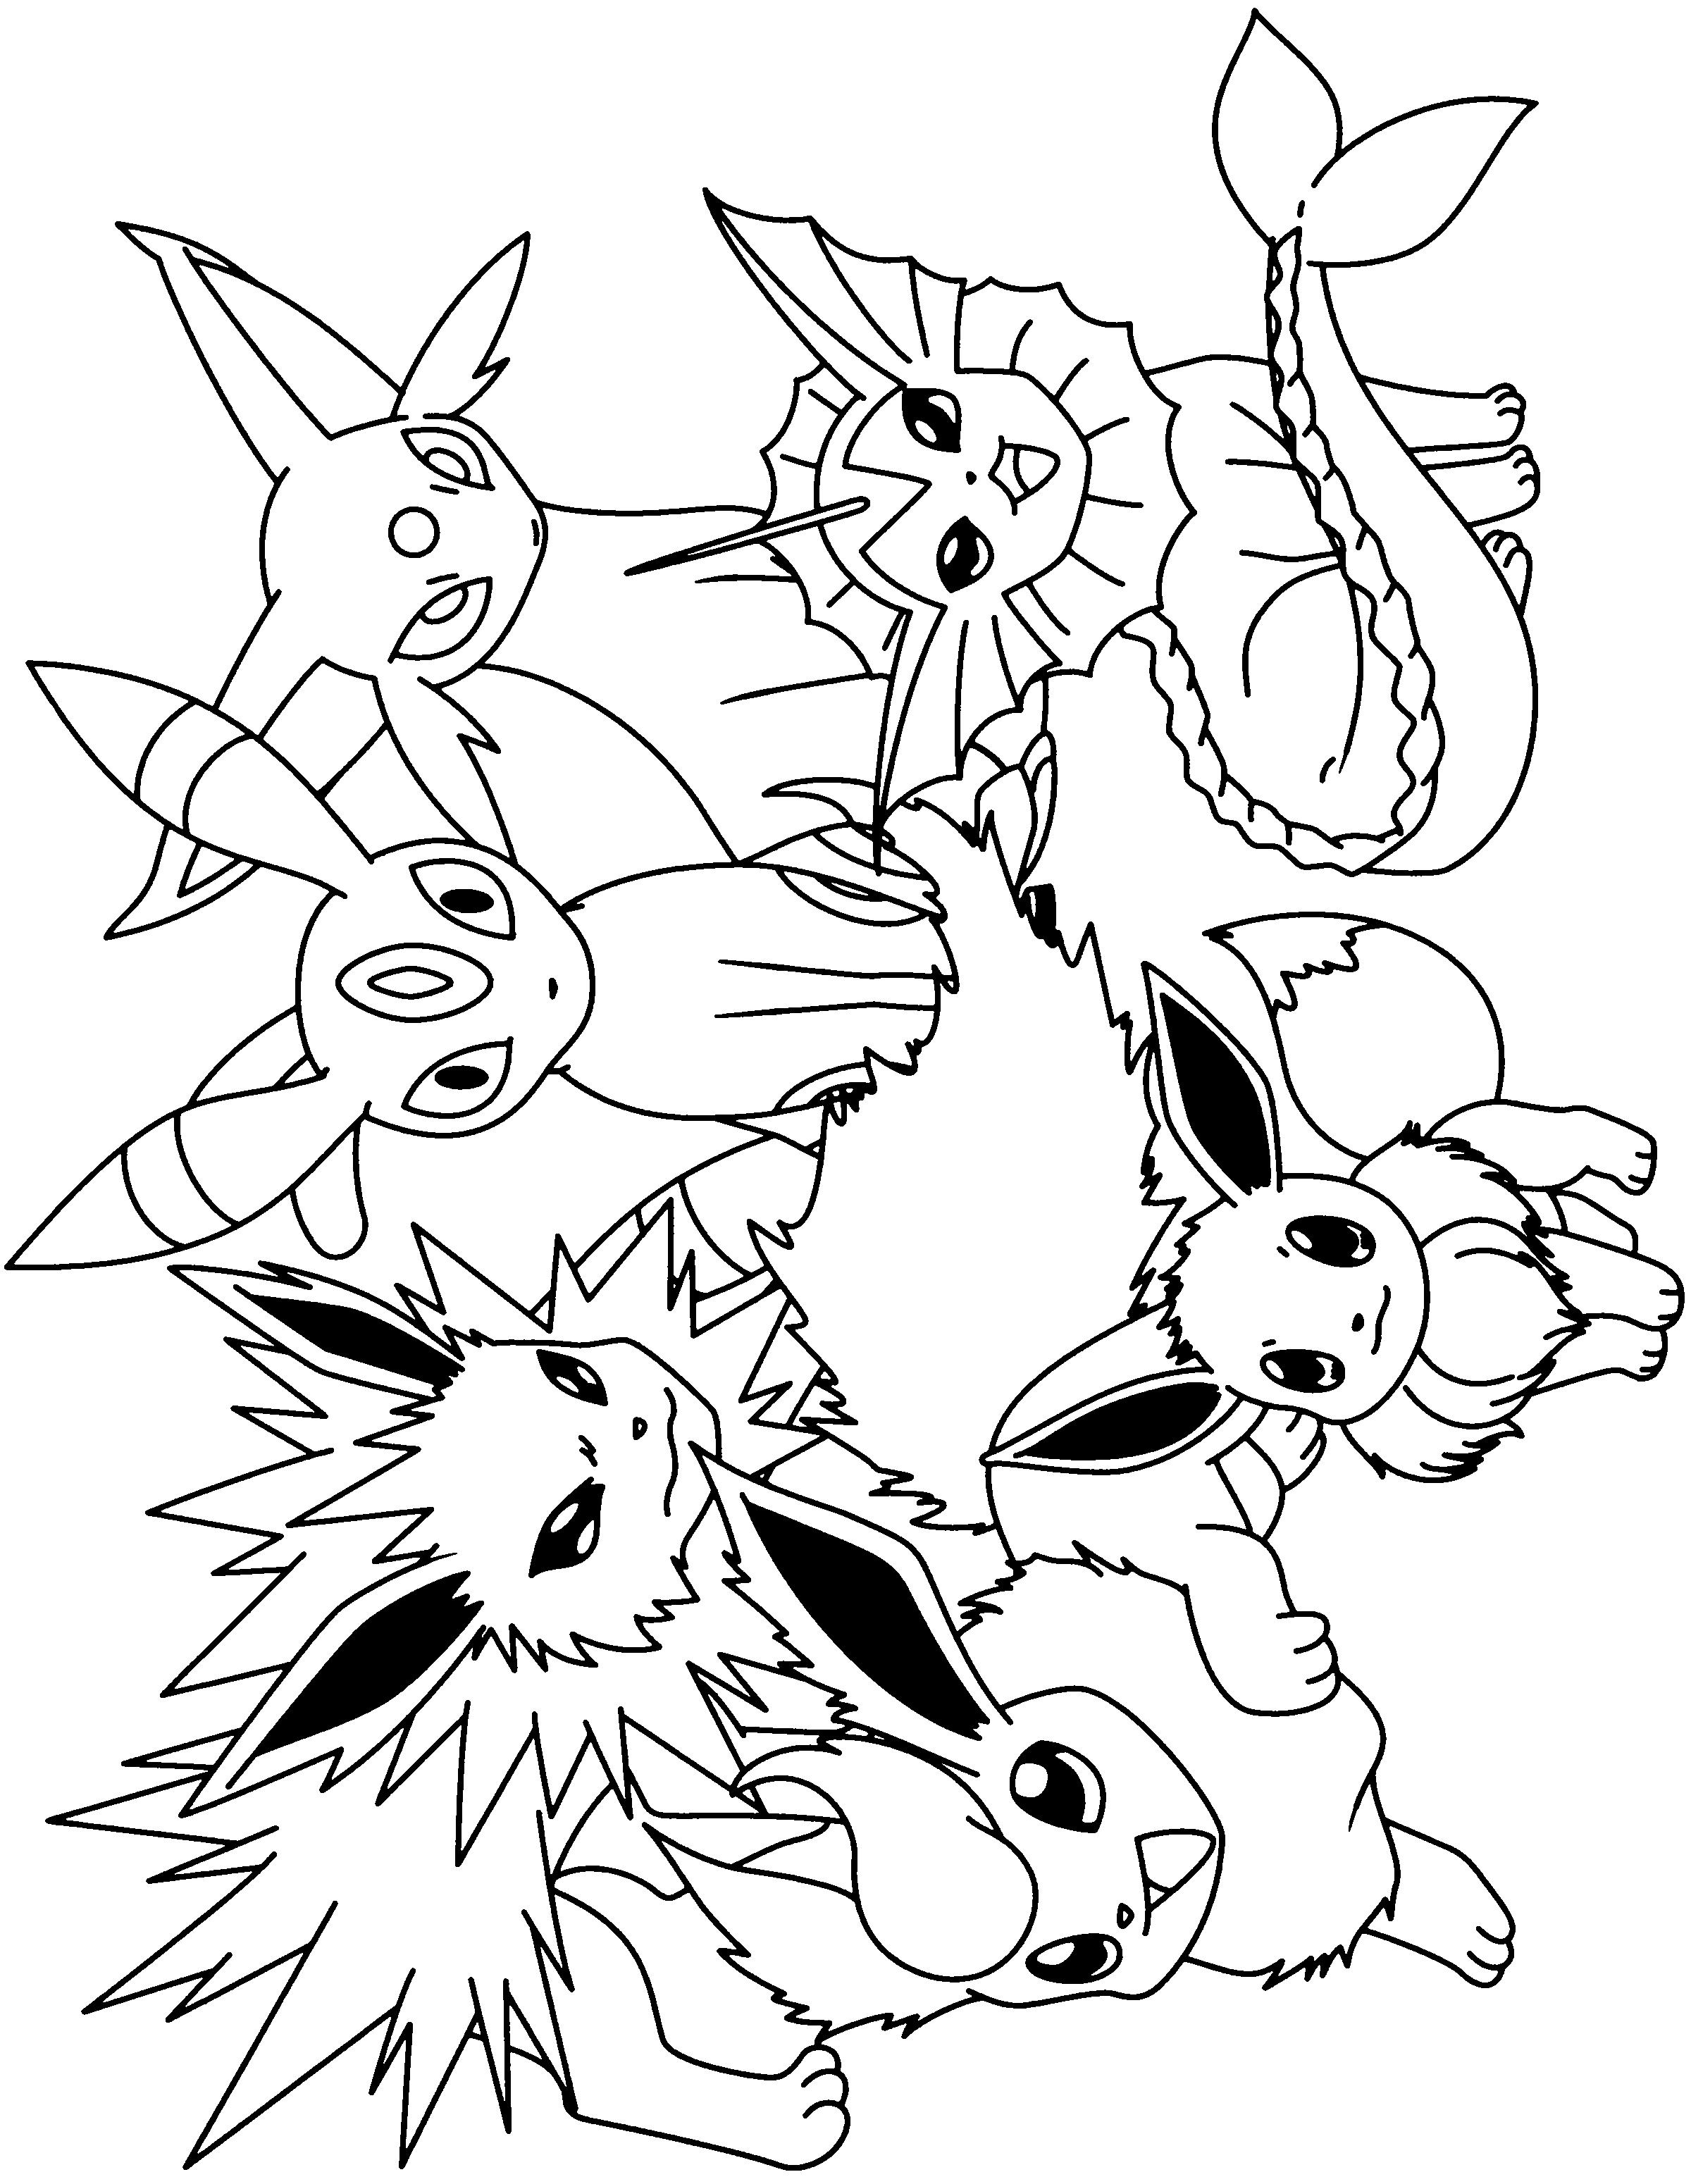 eevee coloring pages pokemon eevee evolutions black and white coloring page pages coloring eevee